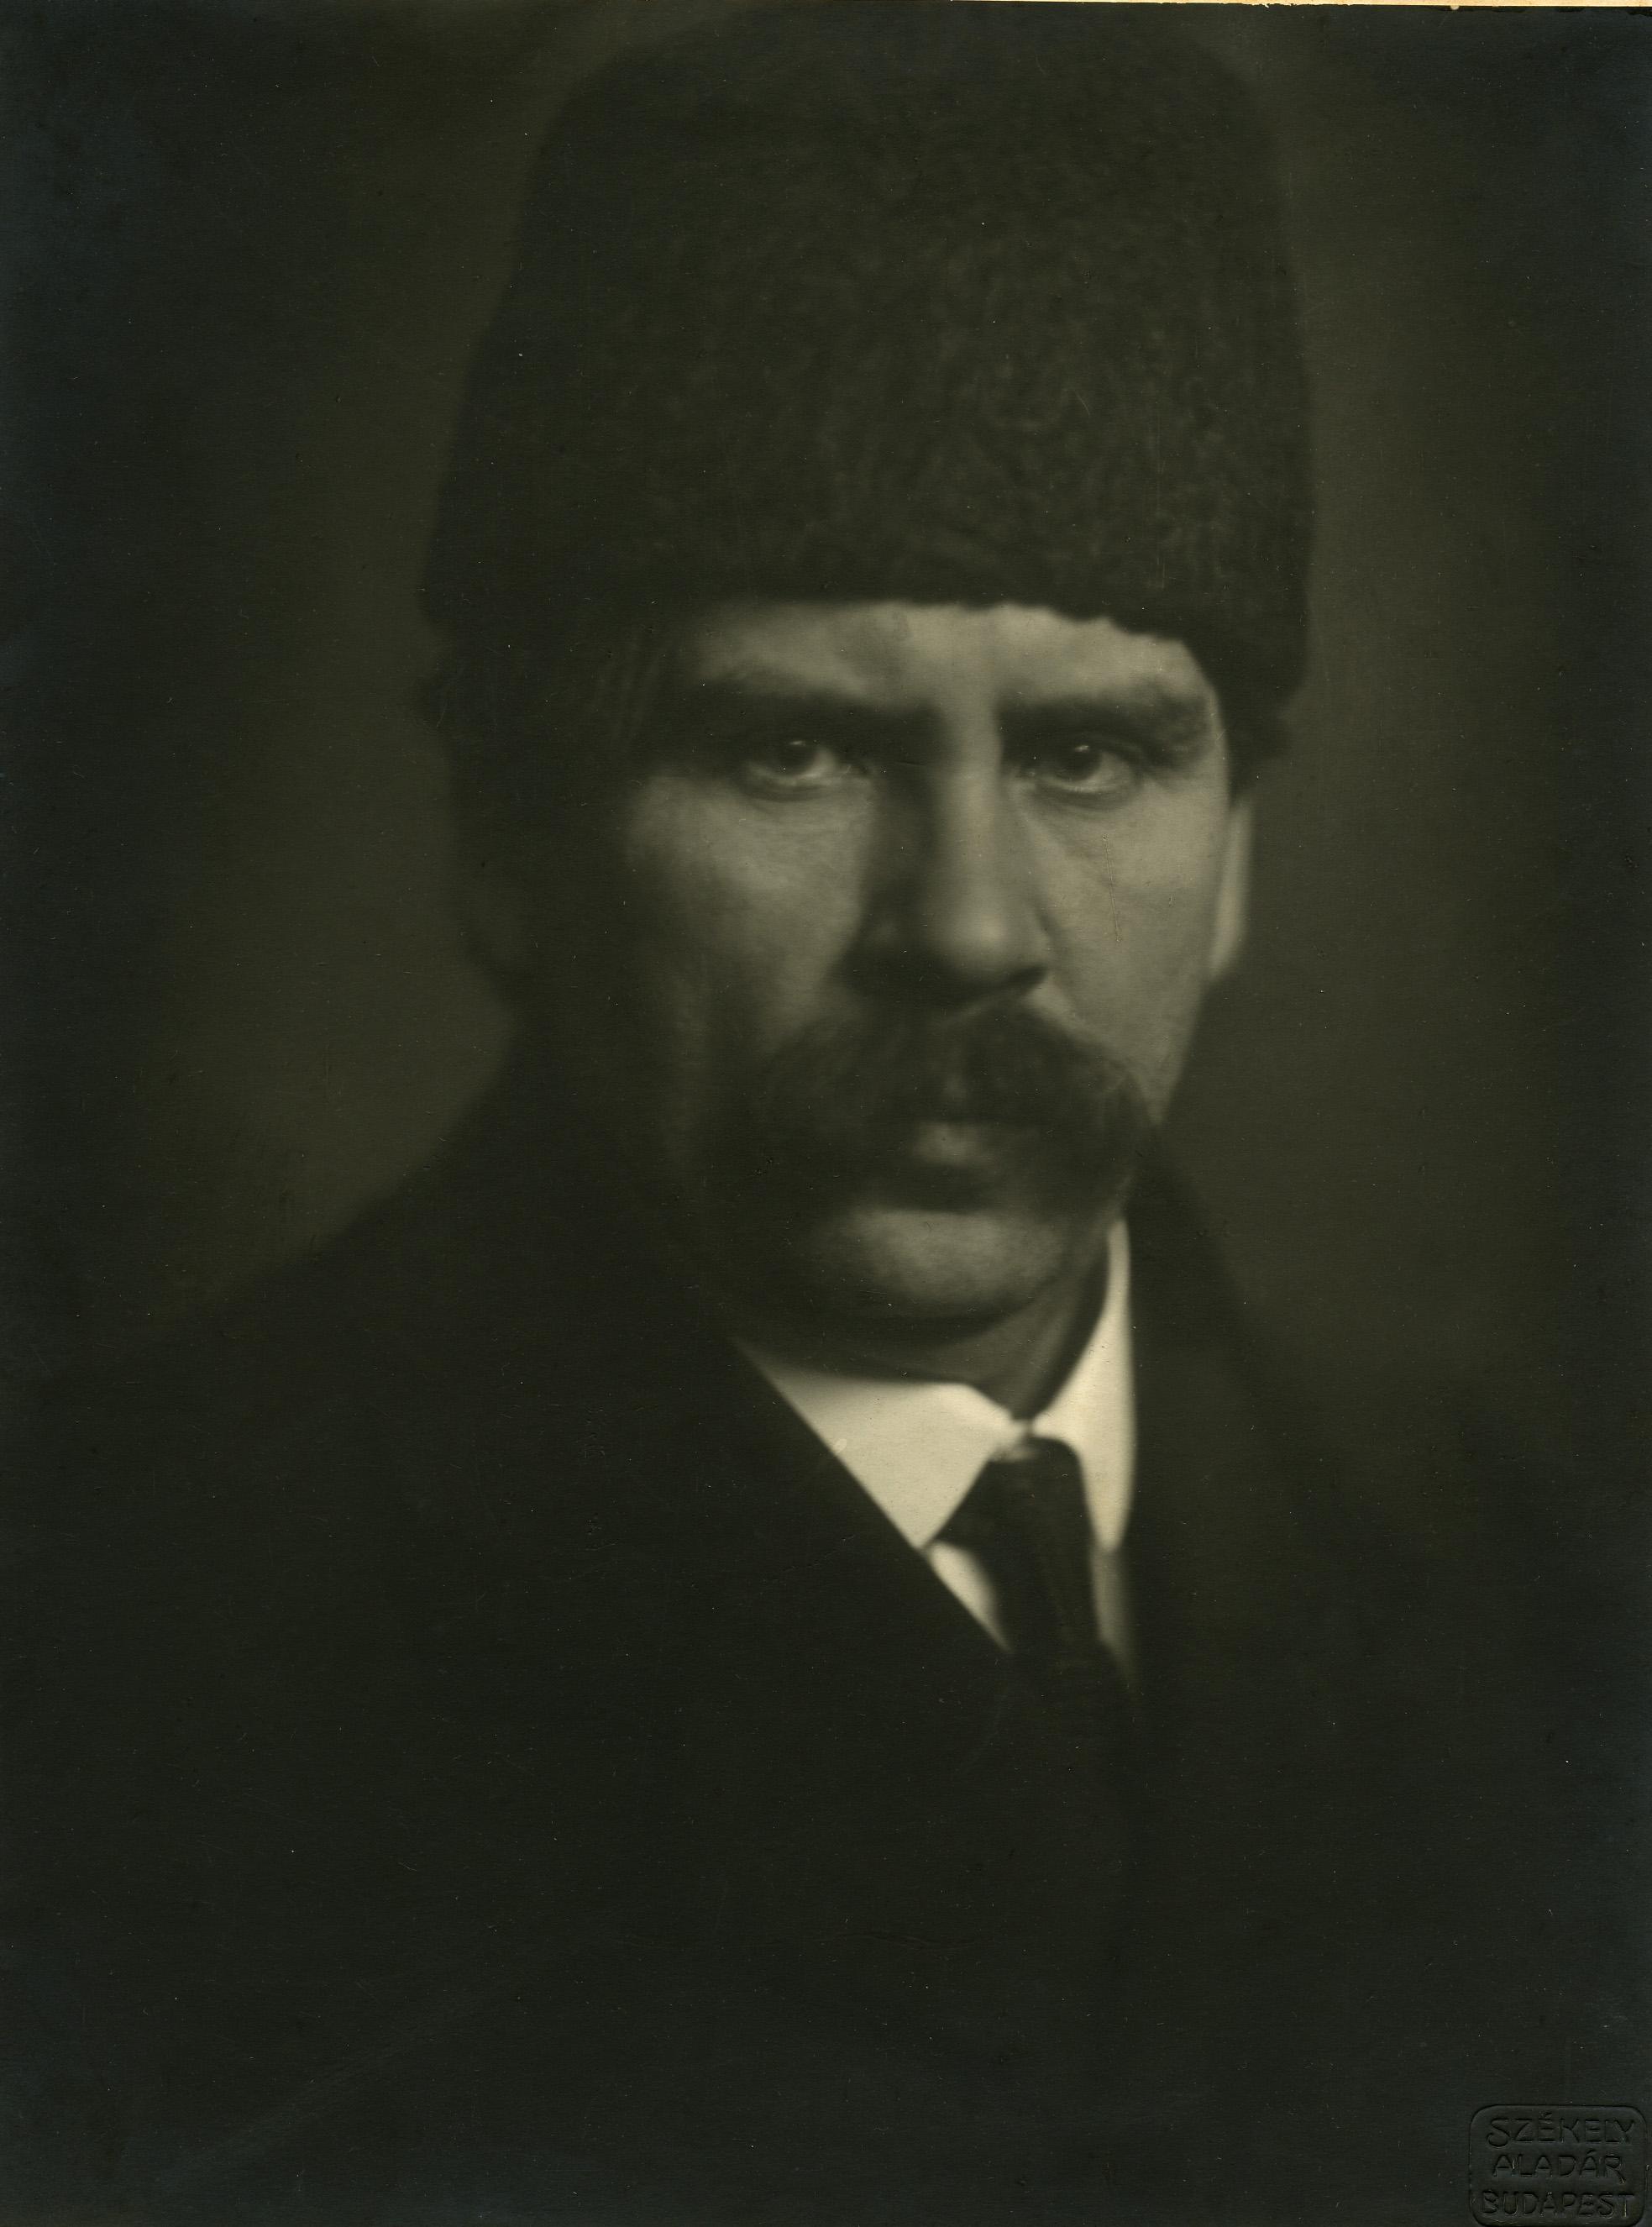 Fotó: Székely Aladár: Móricz Zsigmond, 1919 © Magyar Fotográfiai Múzeum